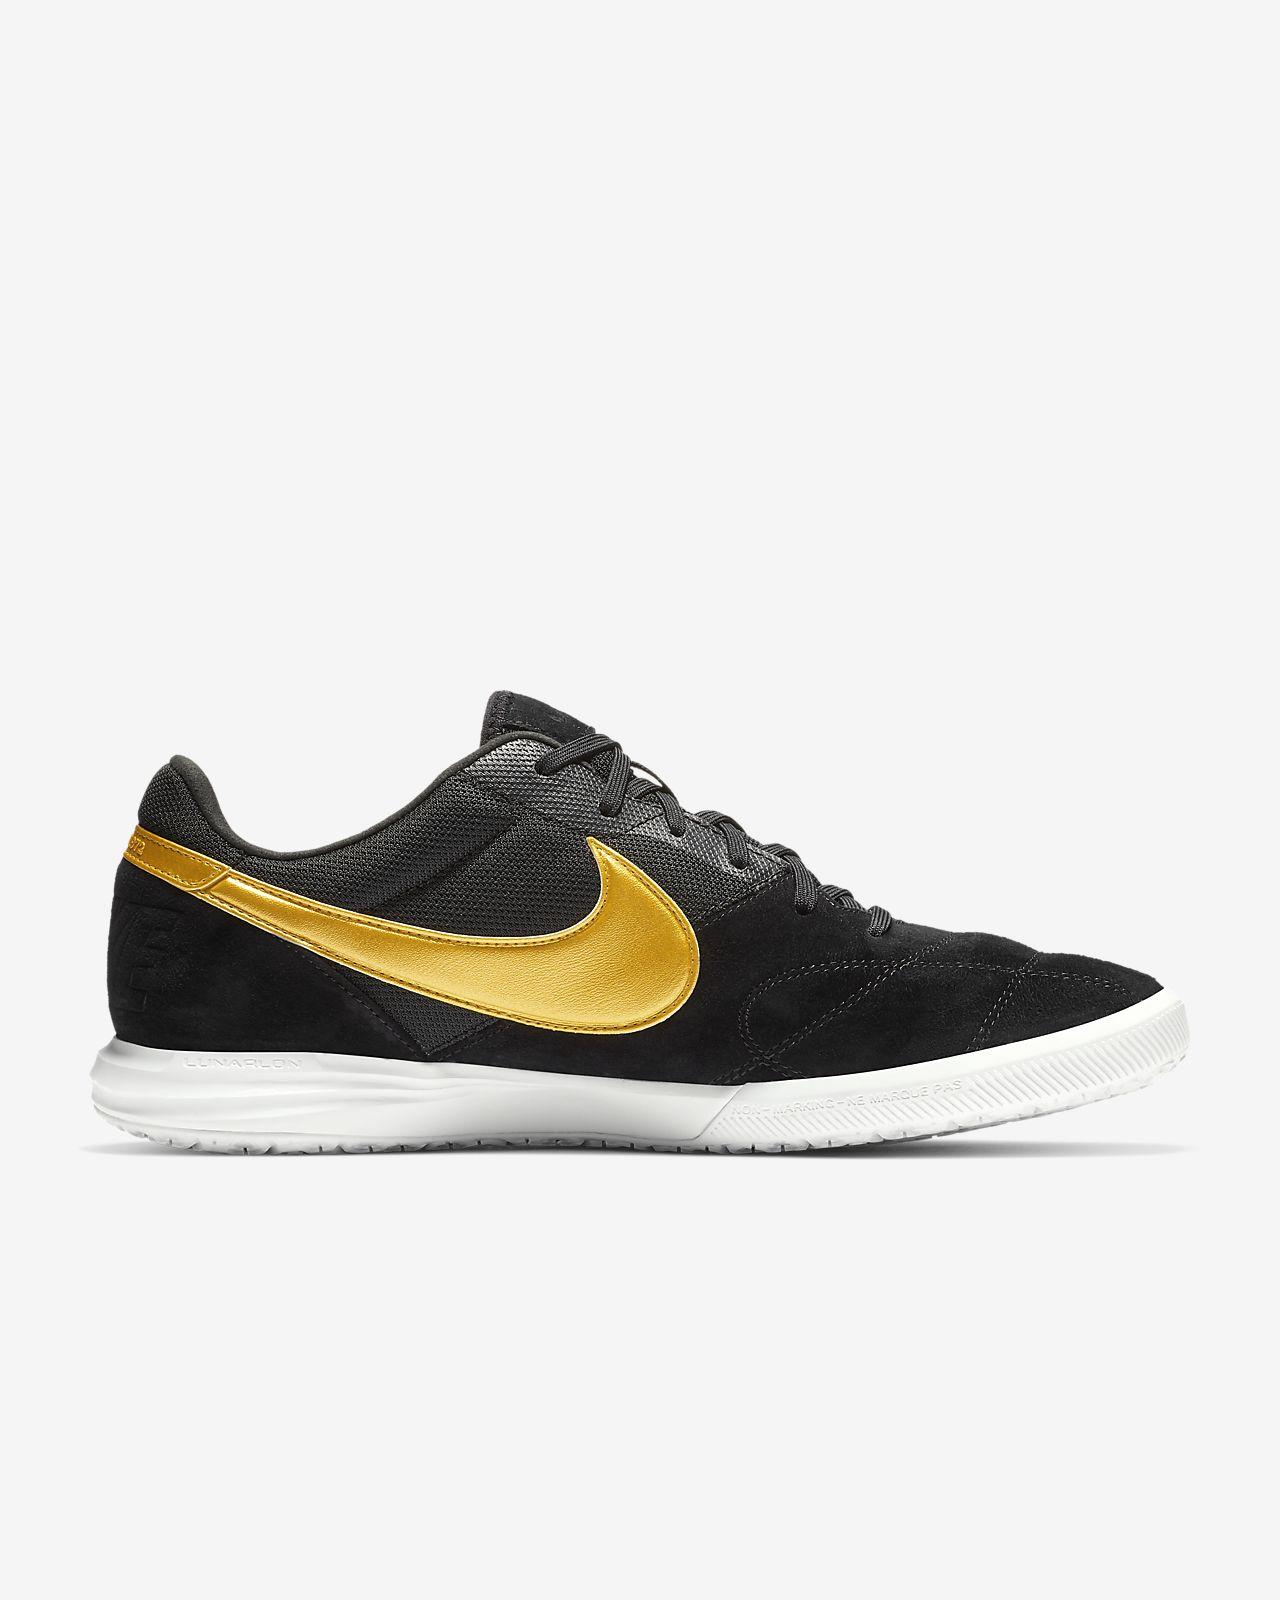 79cdc7ffd5f0b Nike Tiempo Premier II Sala Indoor Court Football Shoe. Nike.com GB